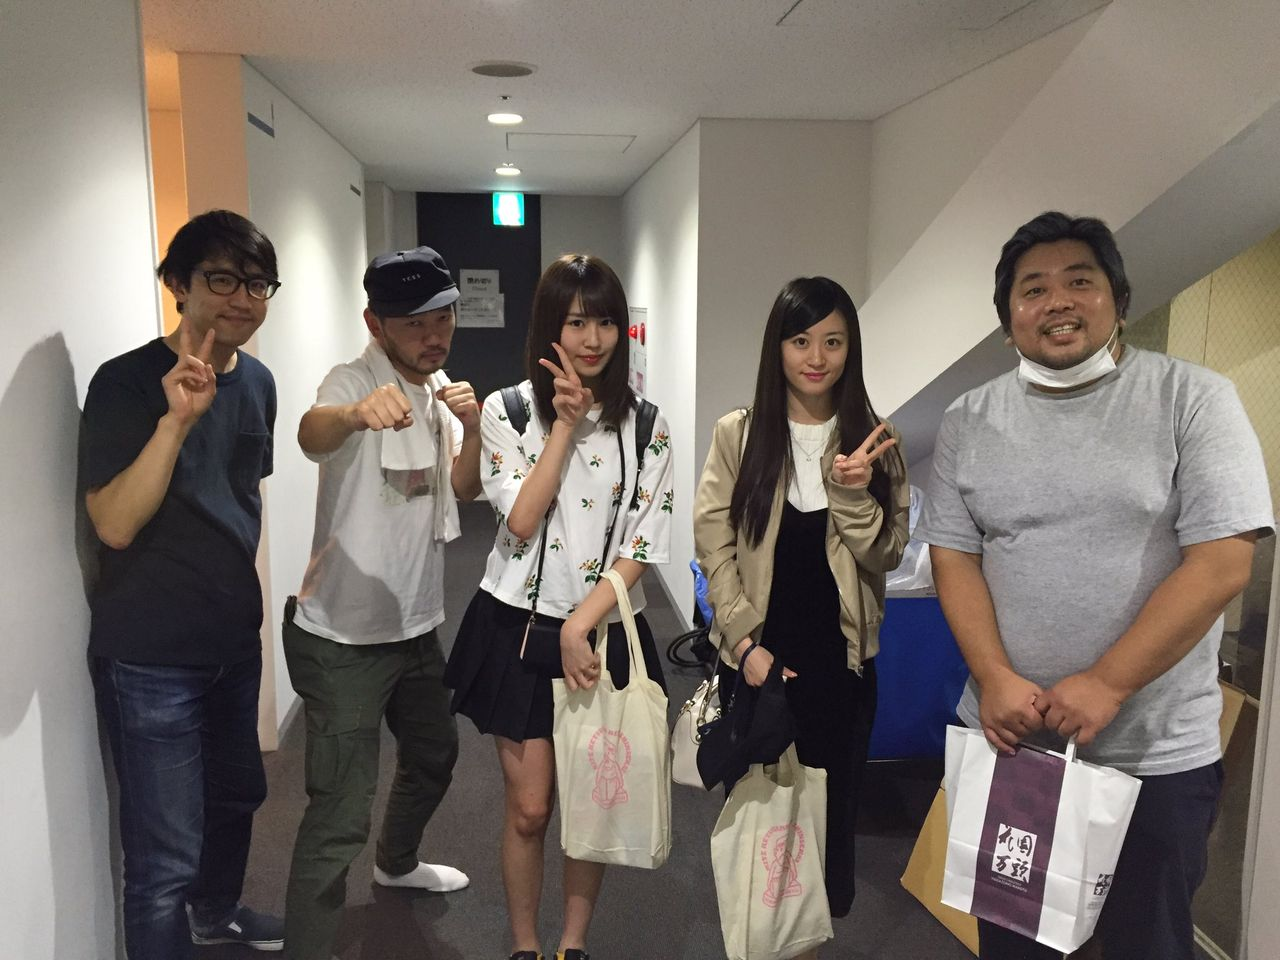 【NMB48】古賀成美・上西恵、ヨーロッパ企画の舞台を観劇